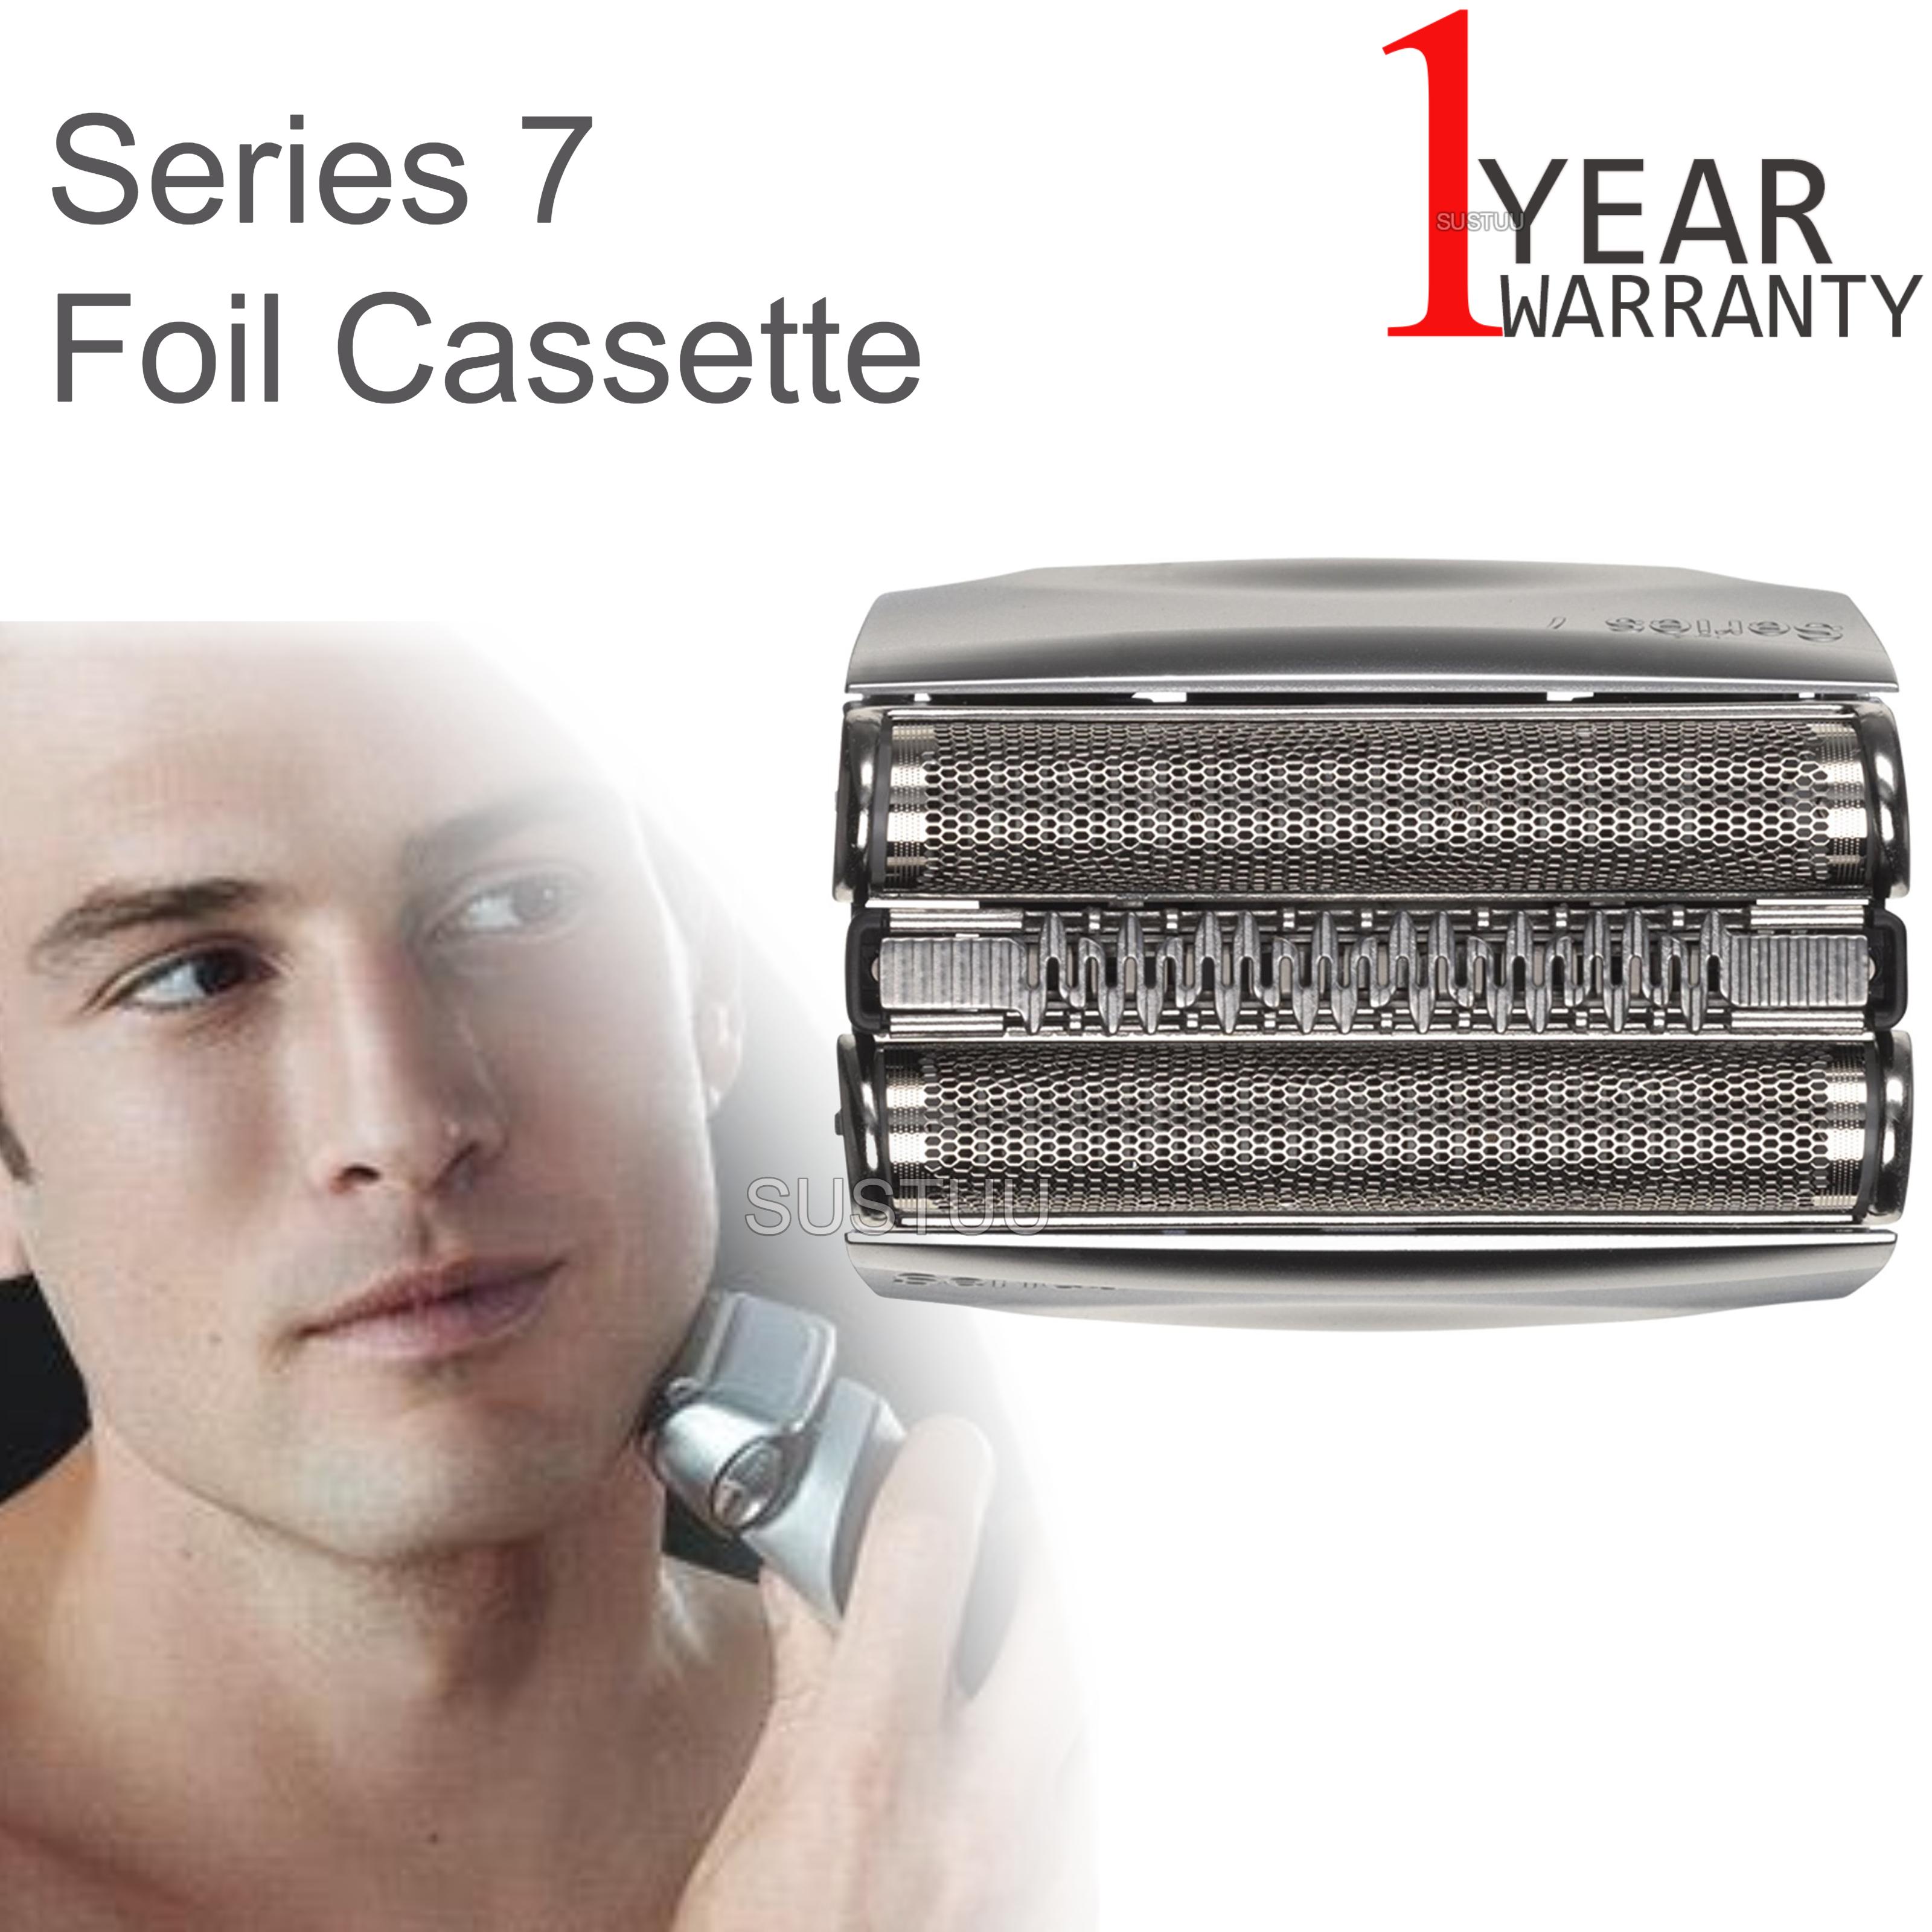 Braun Pulsonic 9000 Series 7 Foil Cassette | Shaver Replacement Head | COM70S | Silver